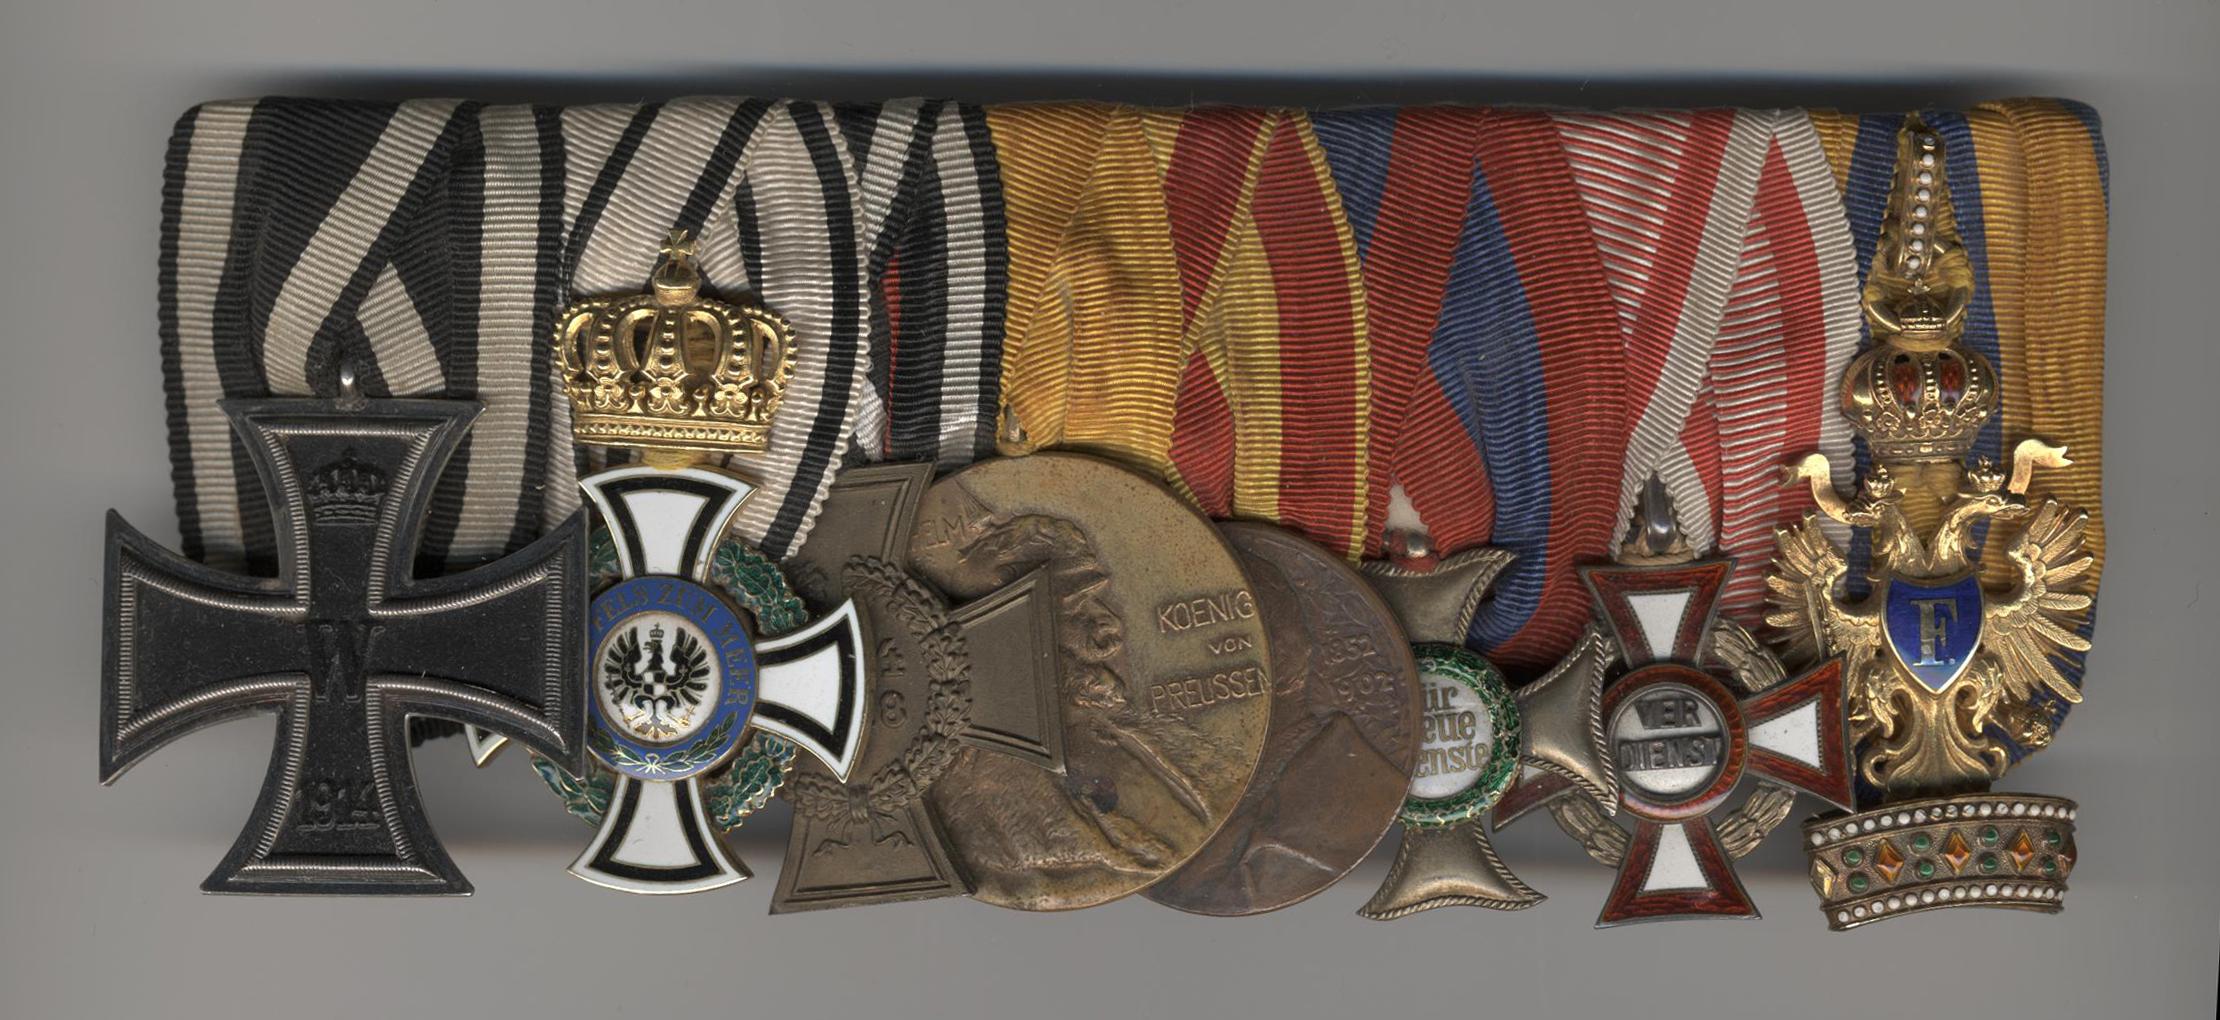 Img 1: The medal bar of Prince Schoenburg-Waldenburg